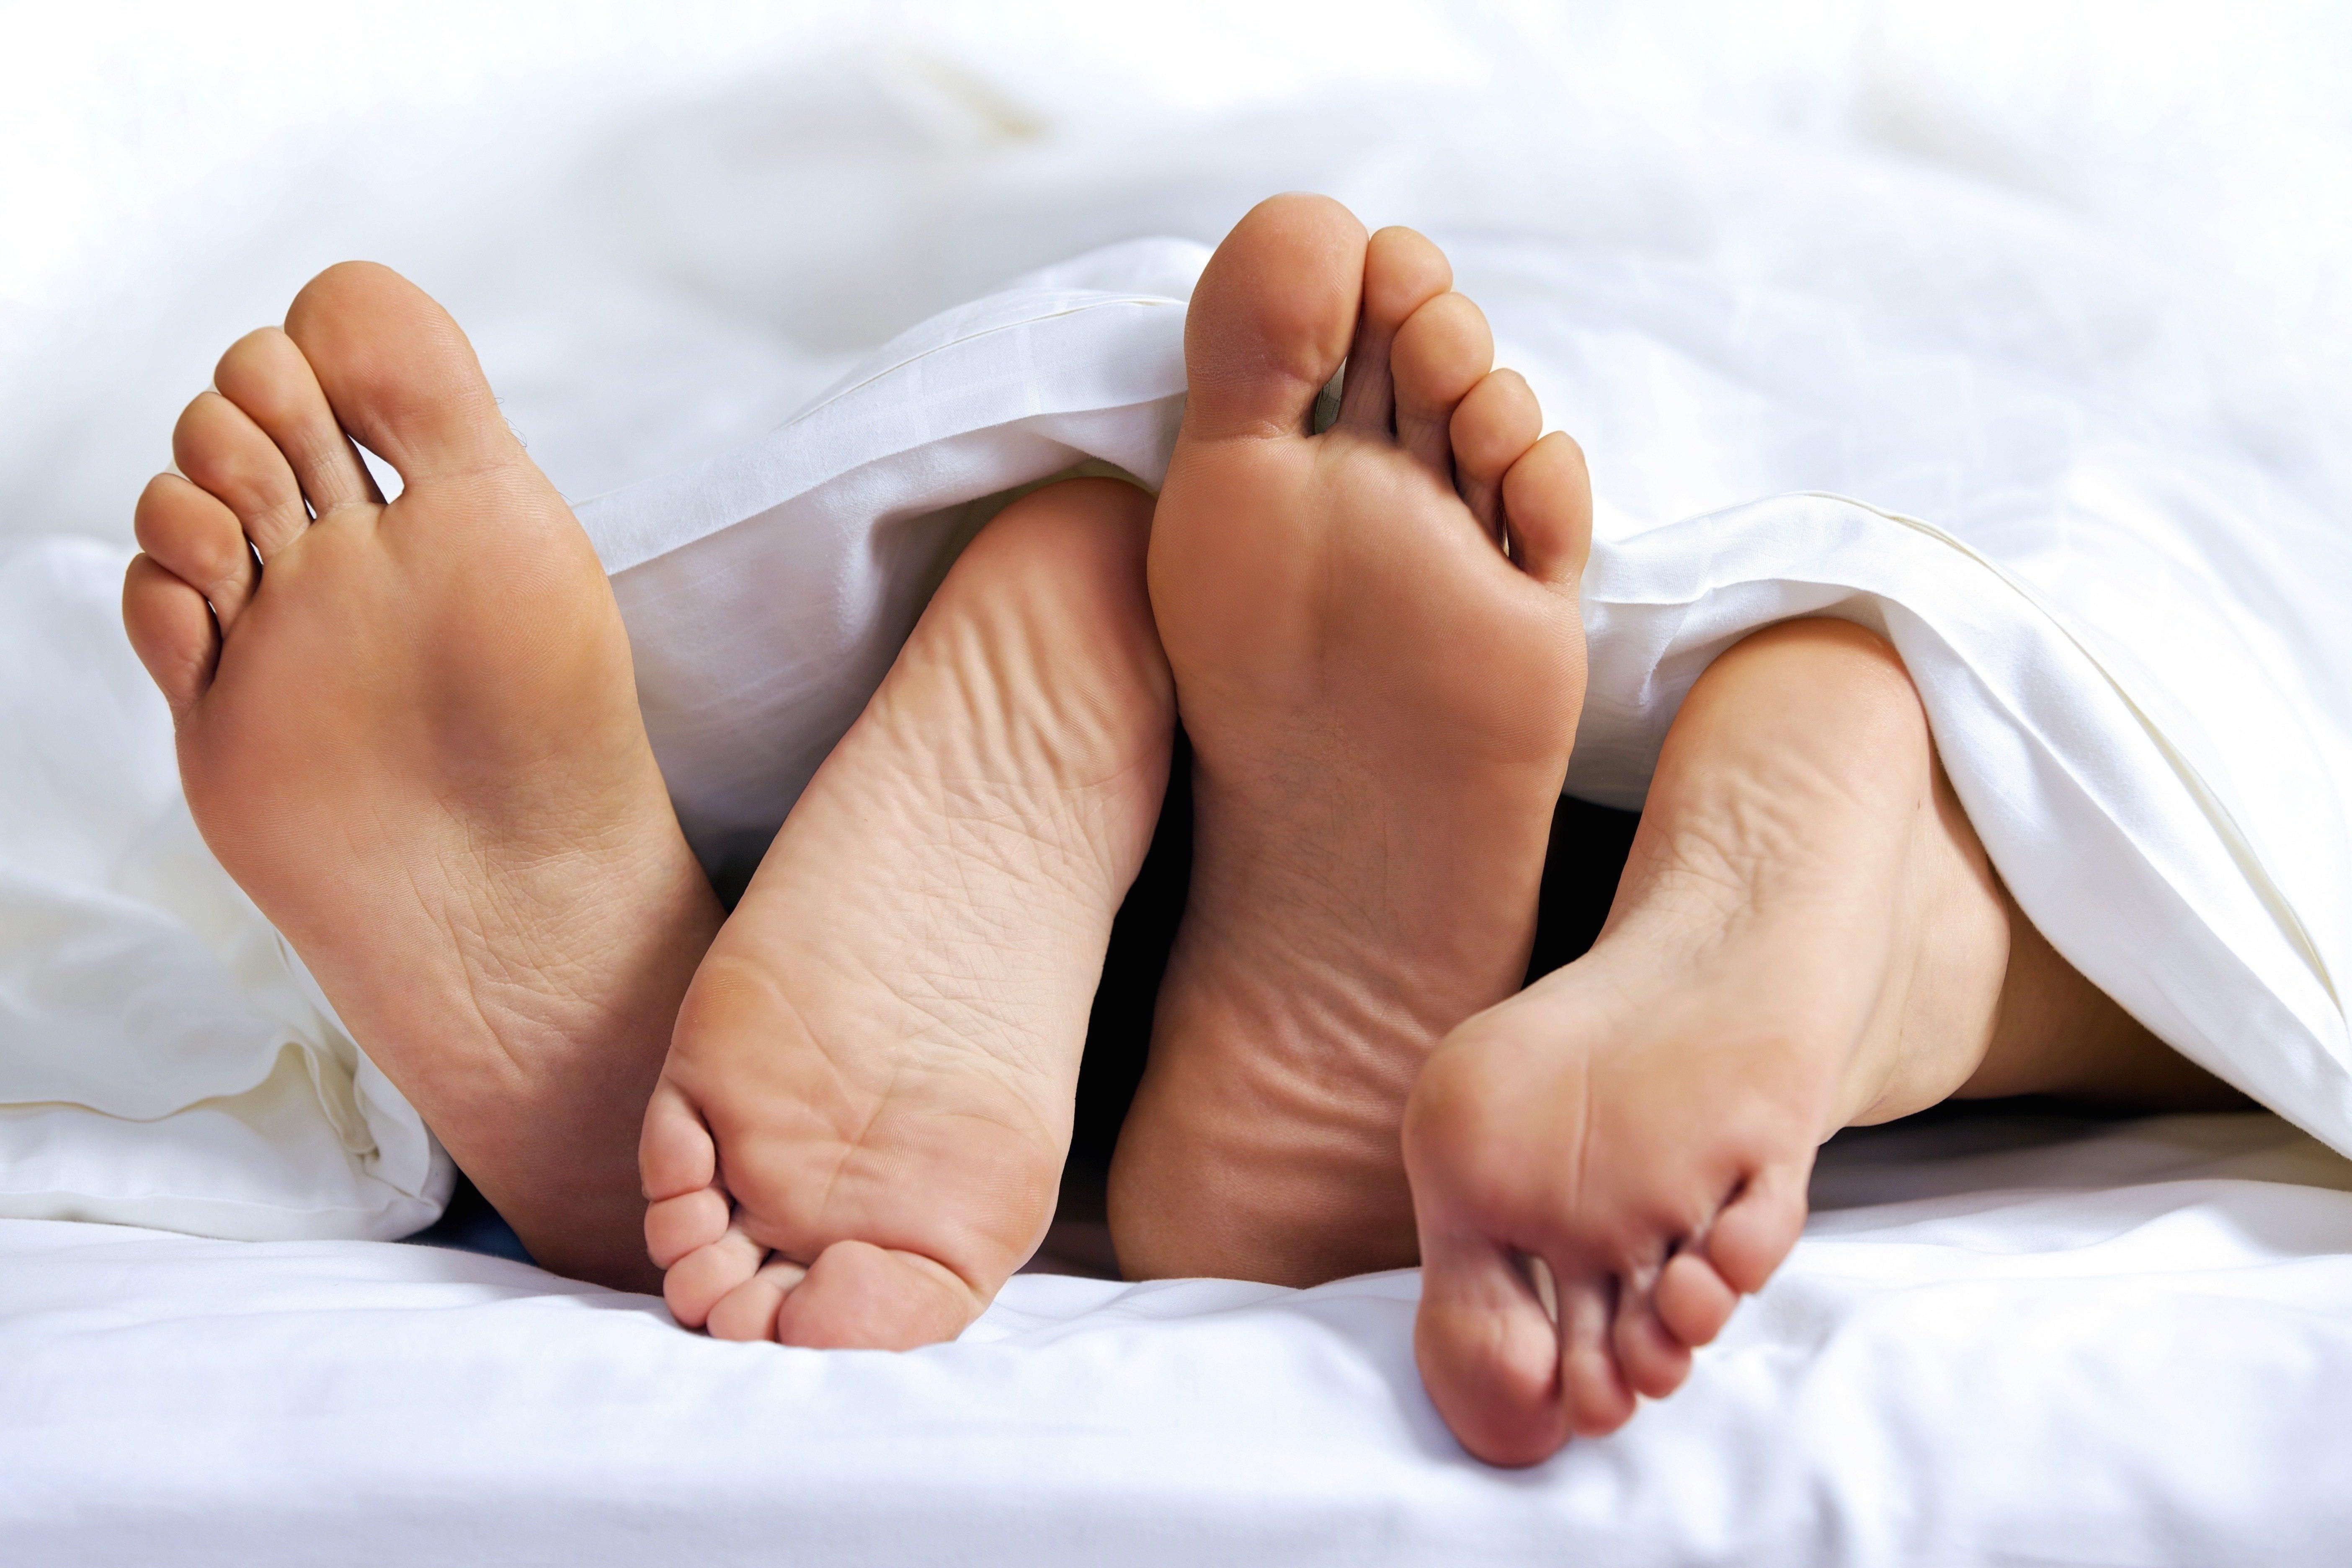 Feet of a couple